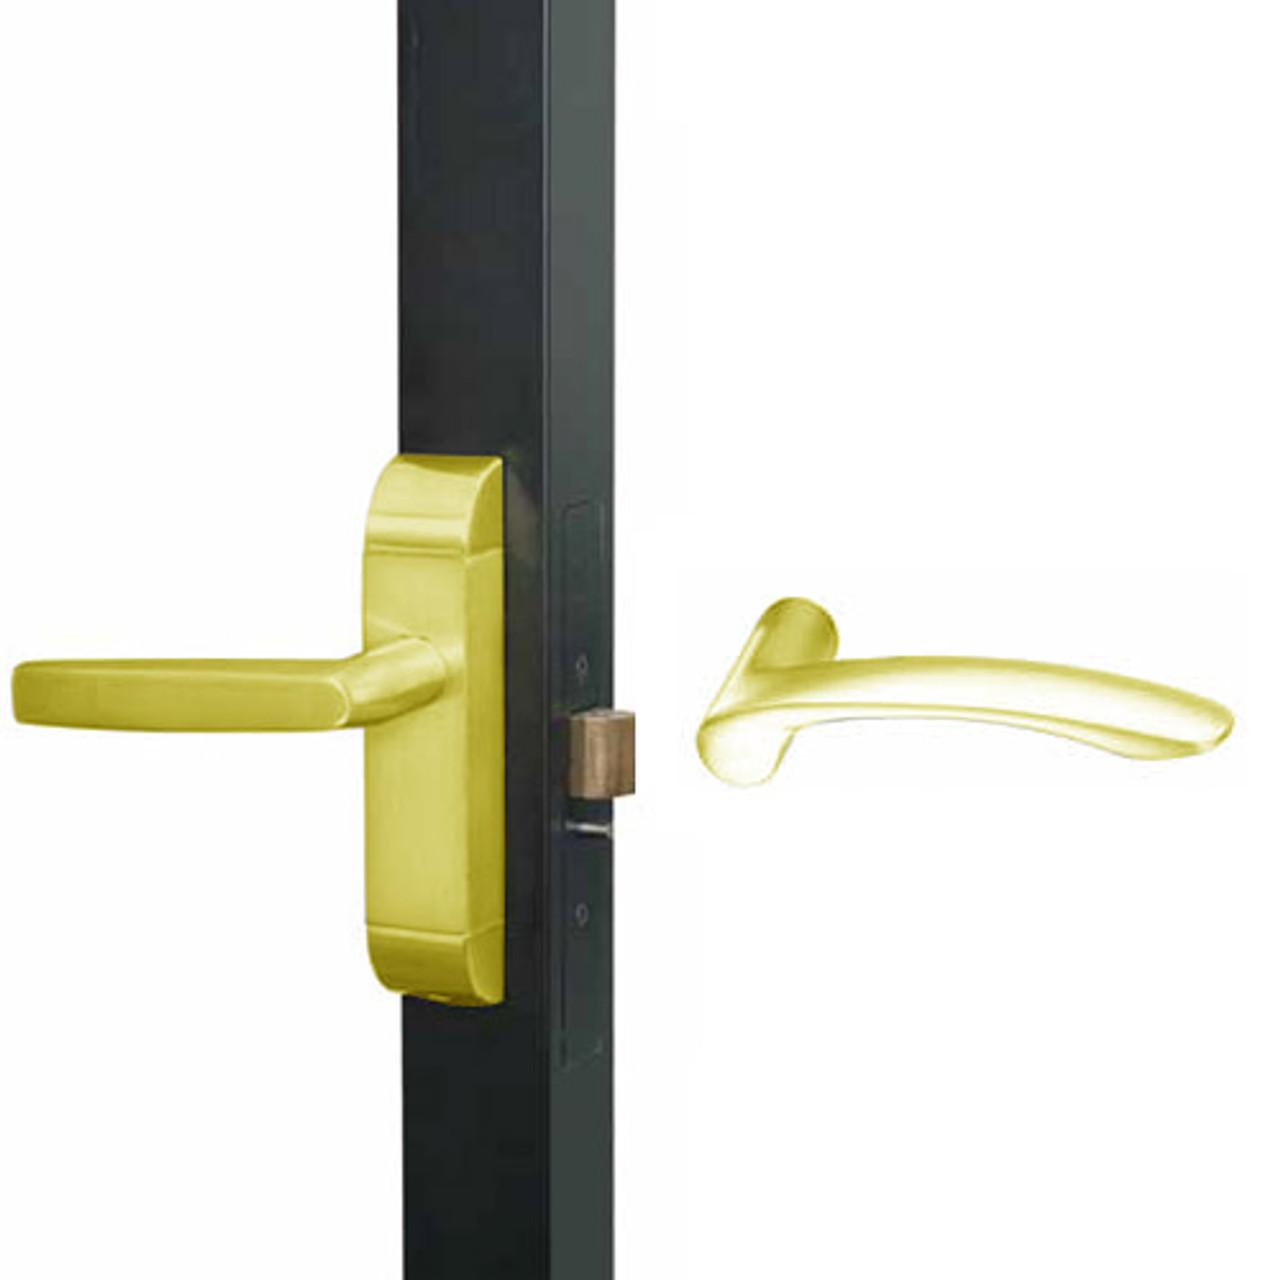 4600M-MV-522-US3 Adams Rite MV Designer Deadlatch handle in Bright Brass Finish